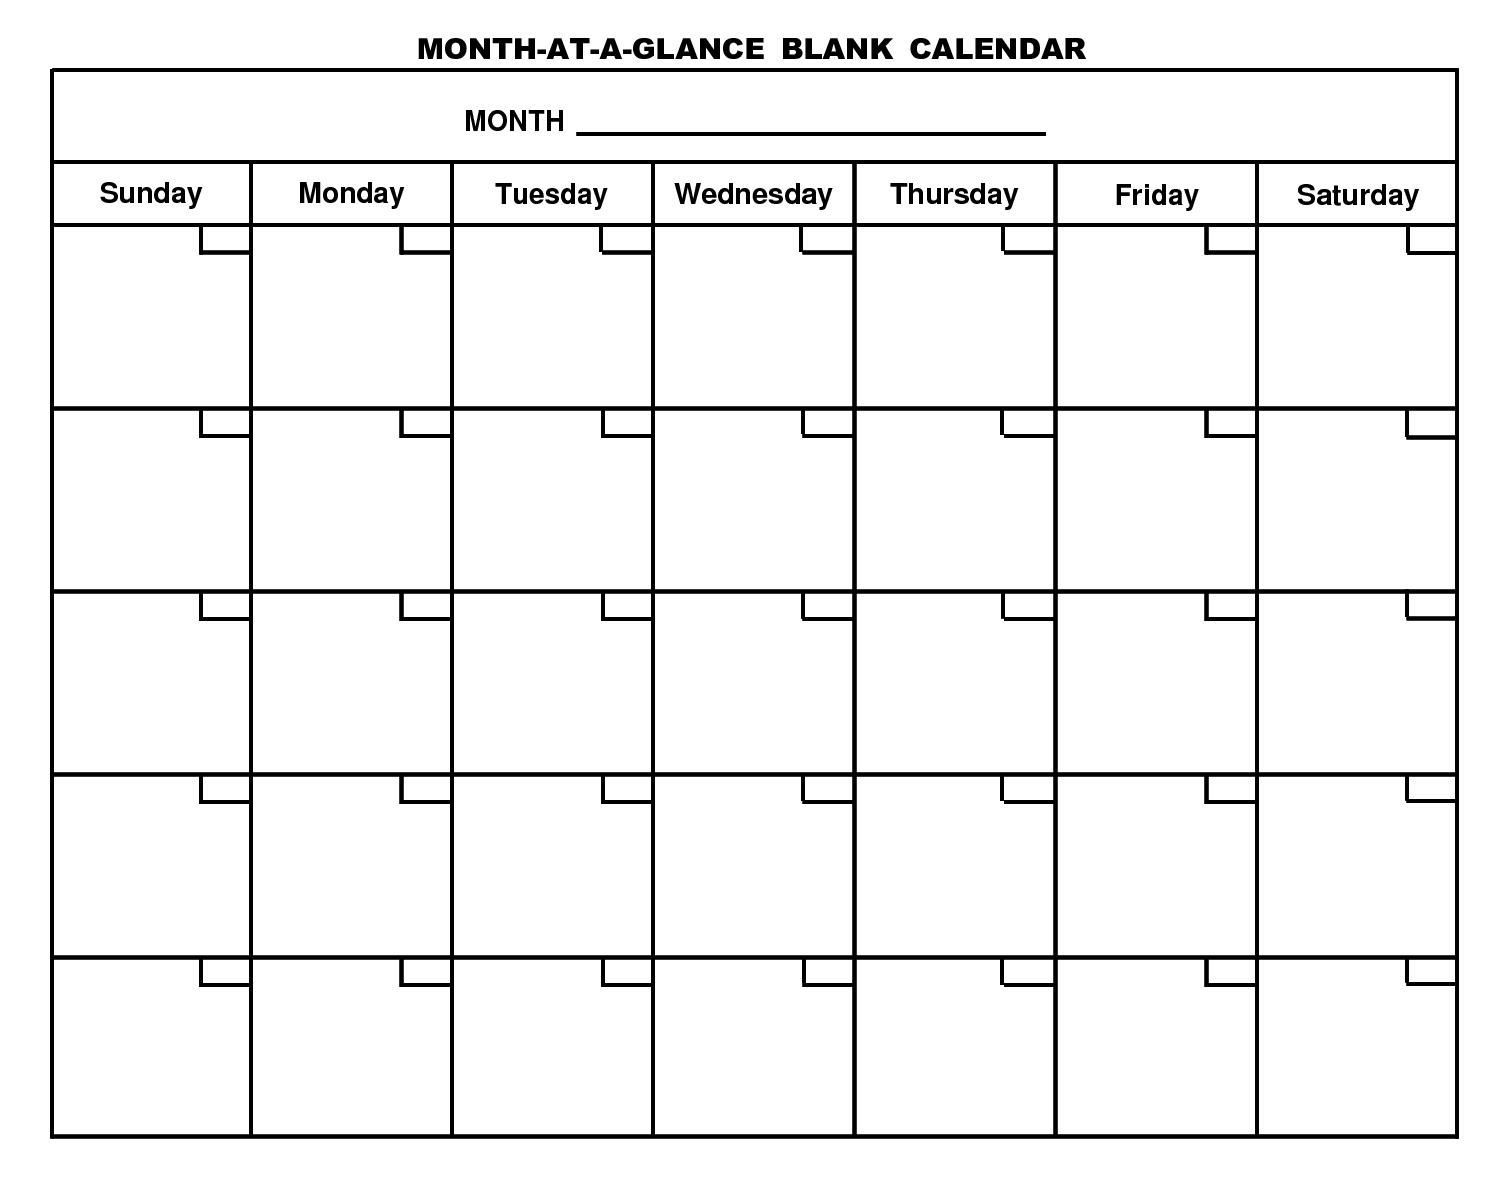 Calendar Month At A Glance • Printable Blank Calendar Template-Month At A Glance Blank Calendar Printable